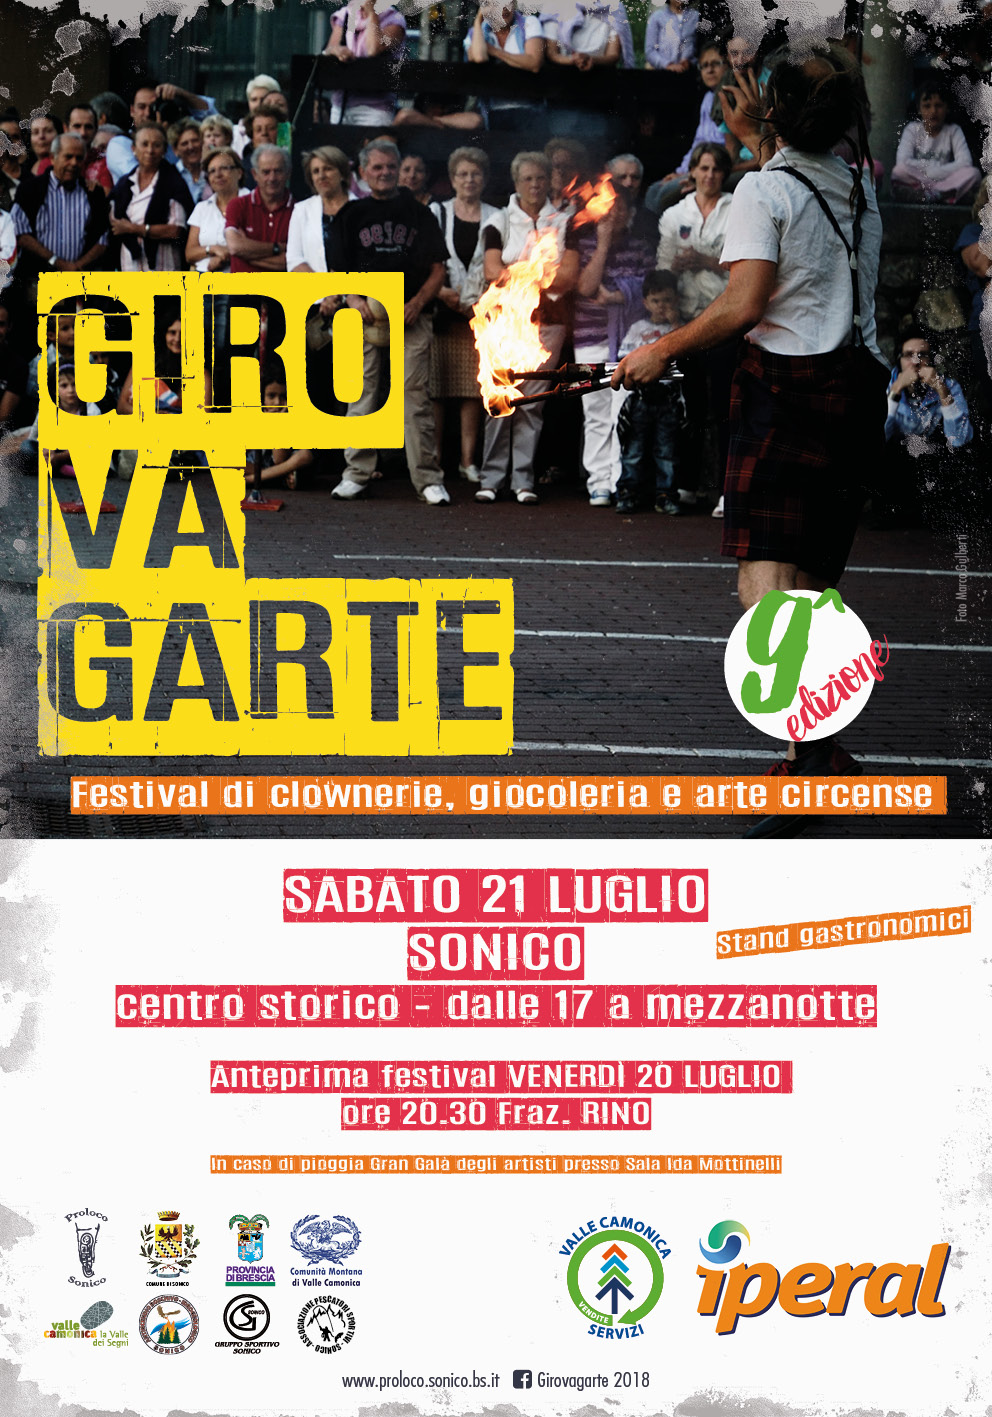 Girovagarte 2018!